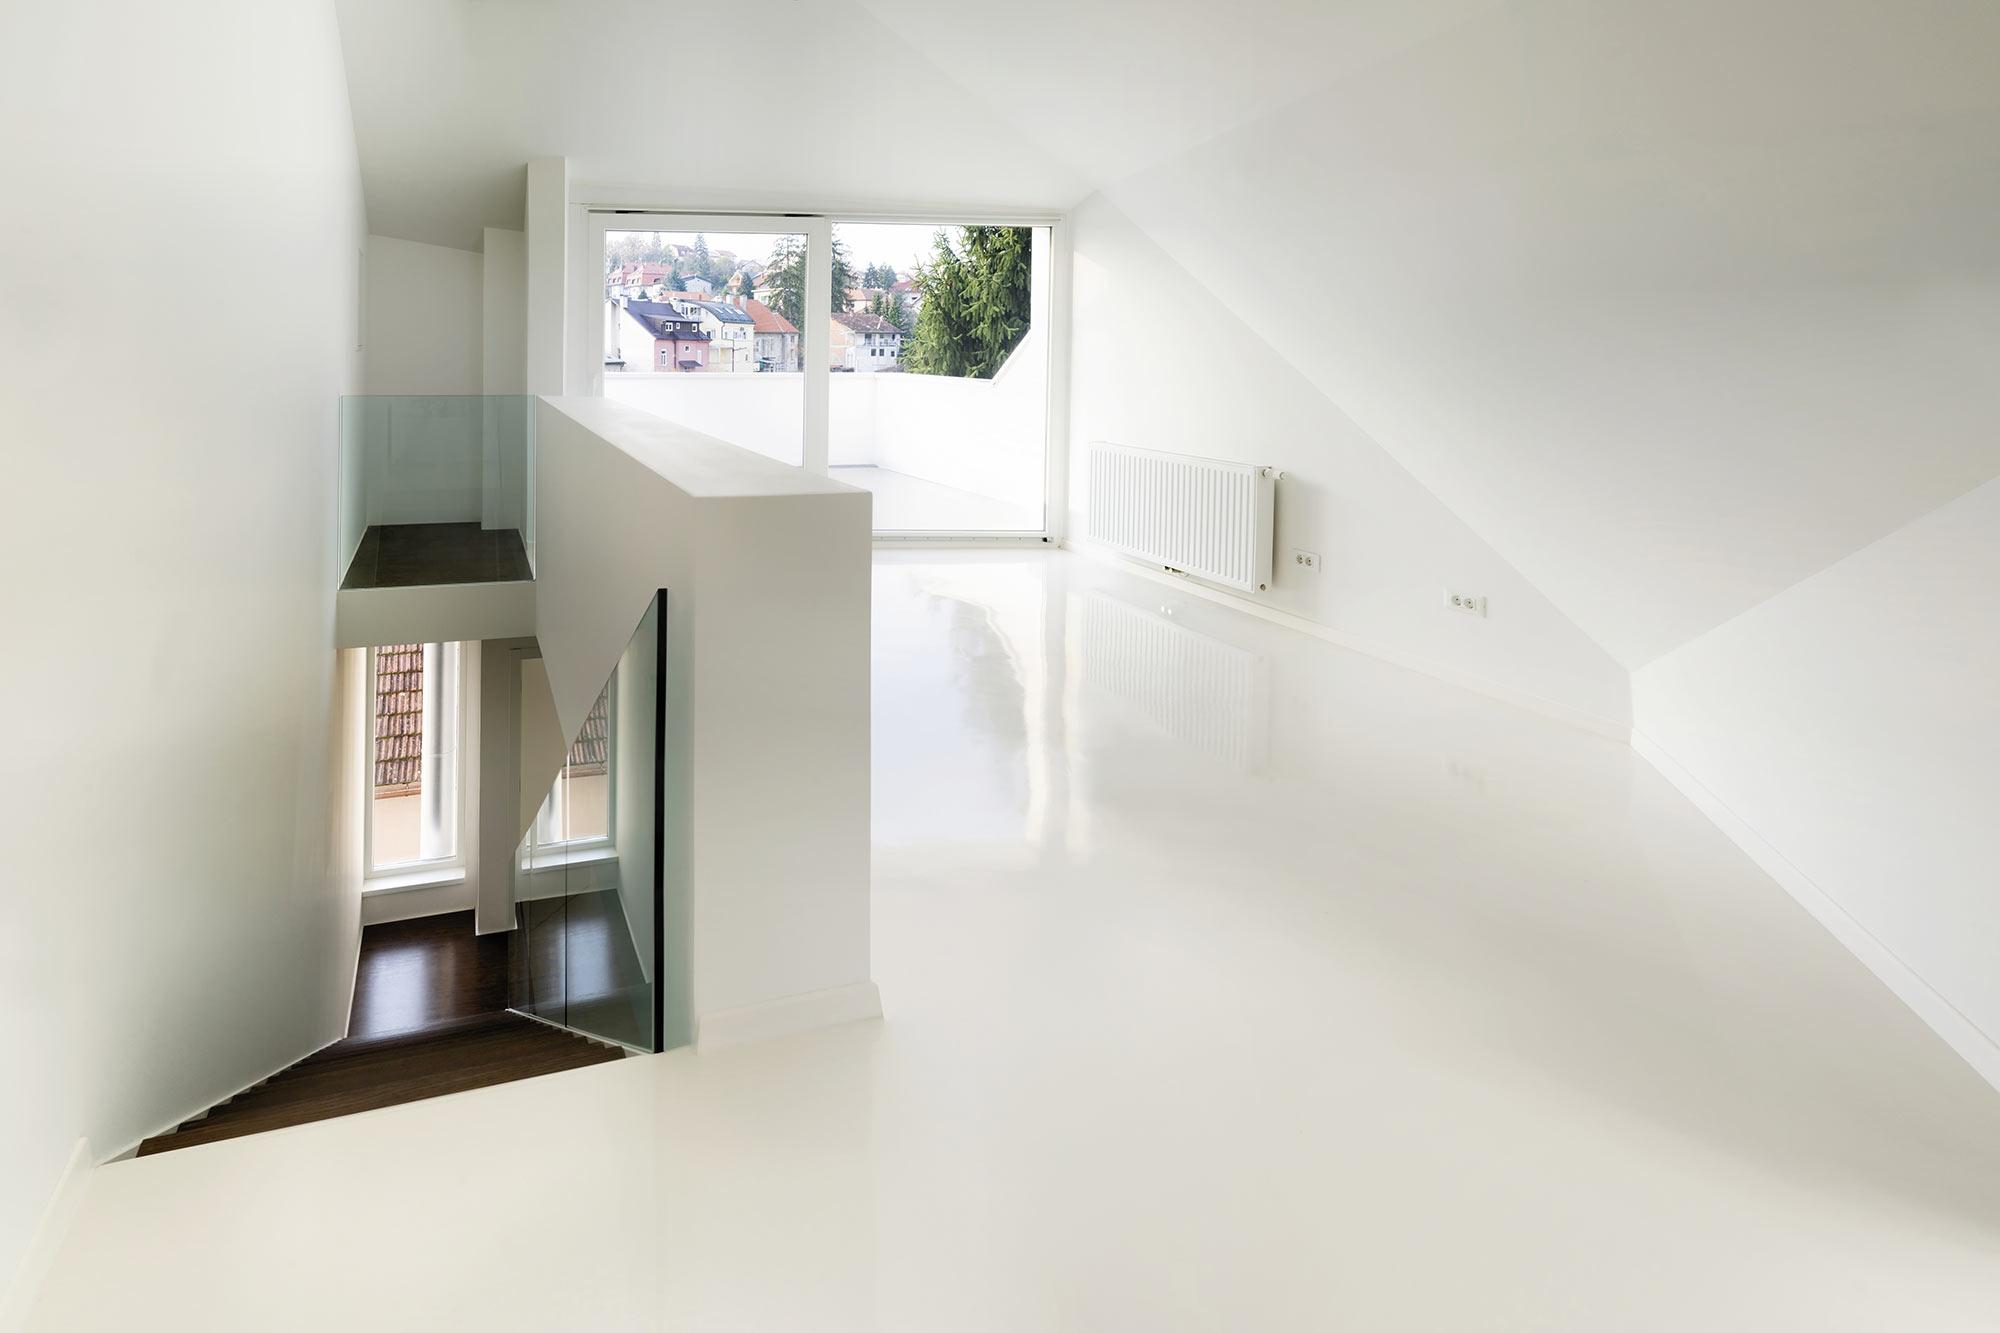 Hallway - Burke Concrete Polishing